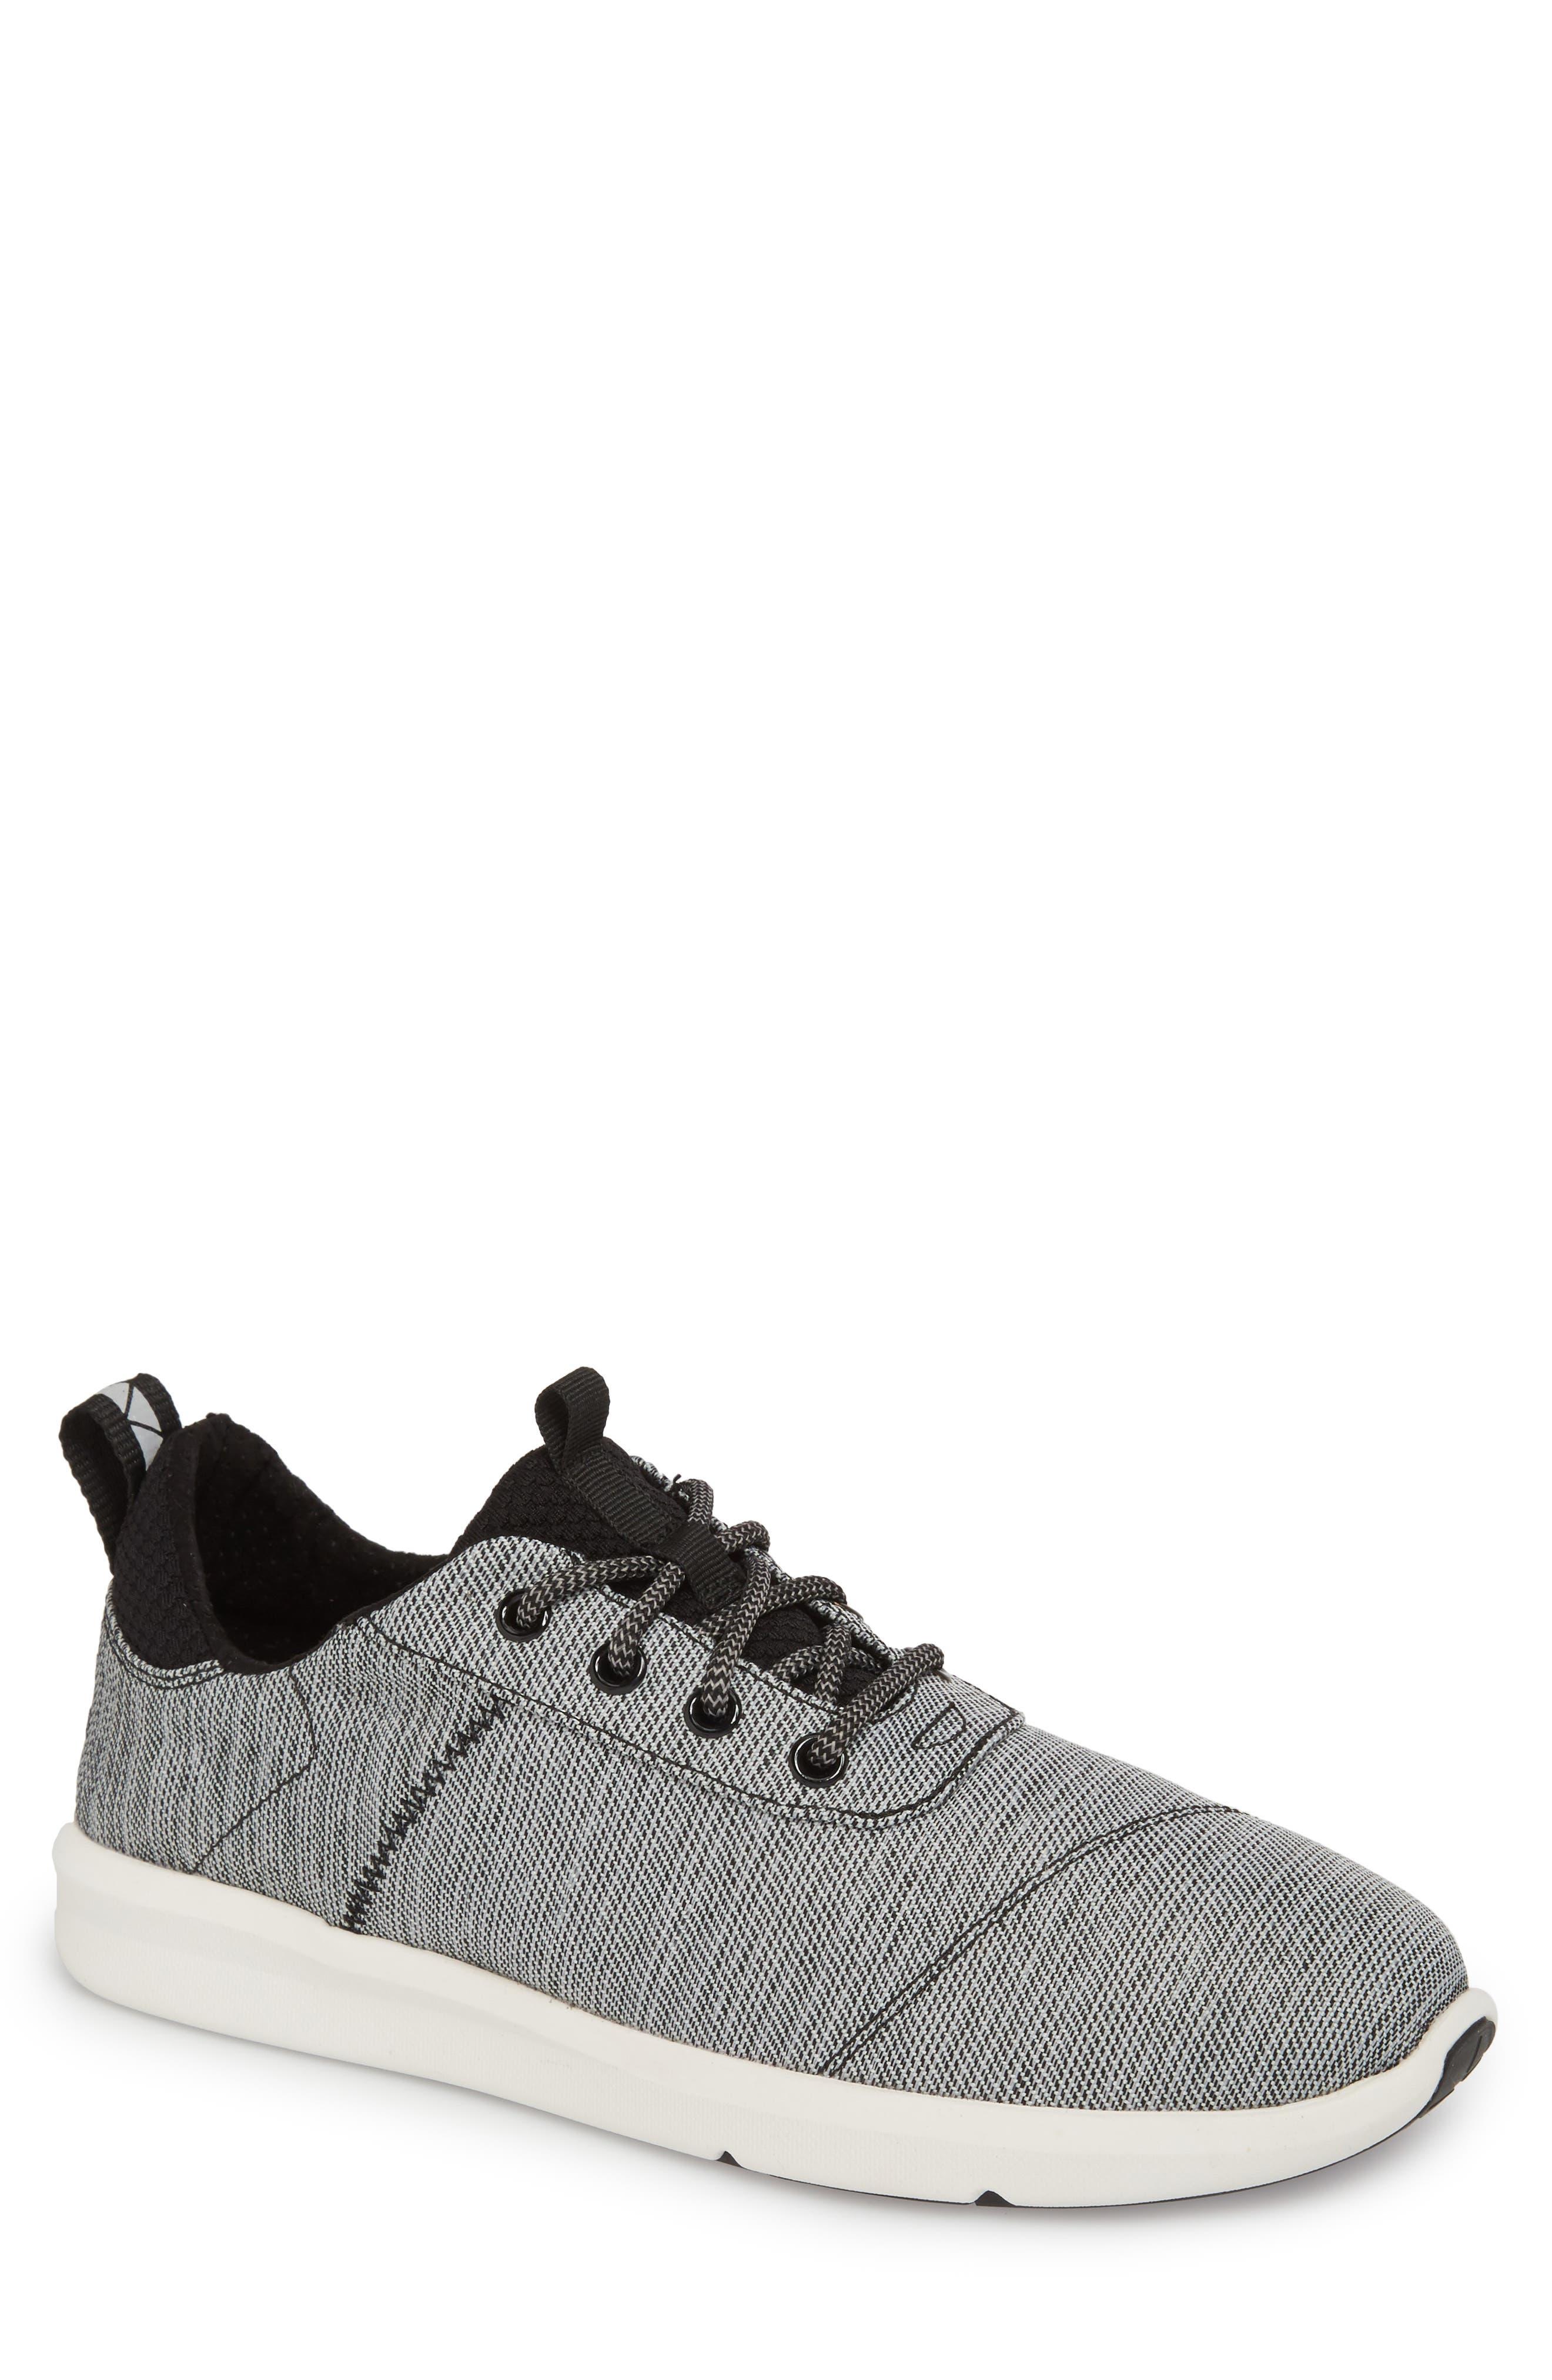 Cabrillo Sneaker,                             Main thumbnail 1, color,                             BLACK SPACE-DYE